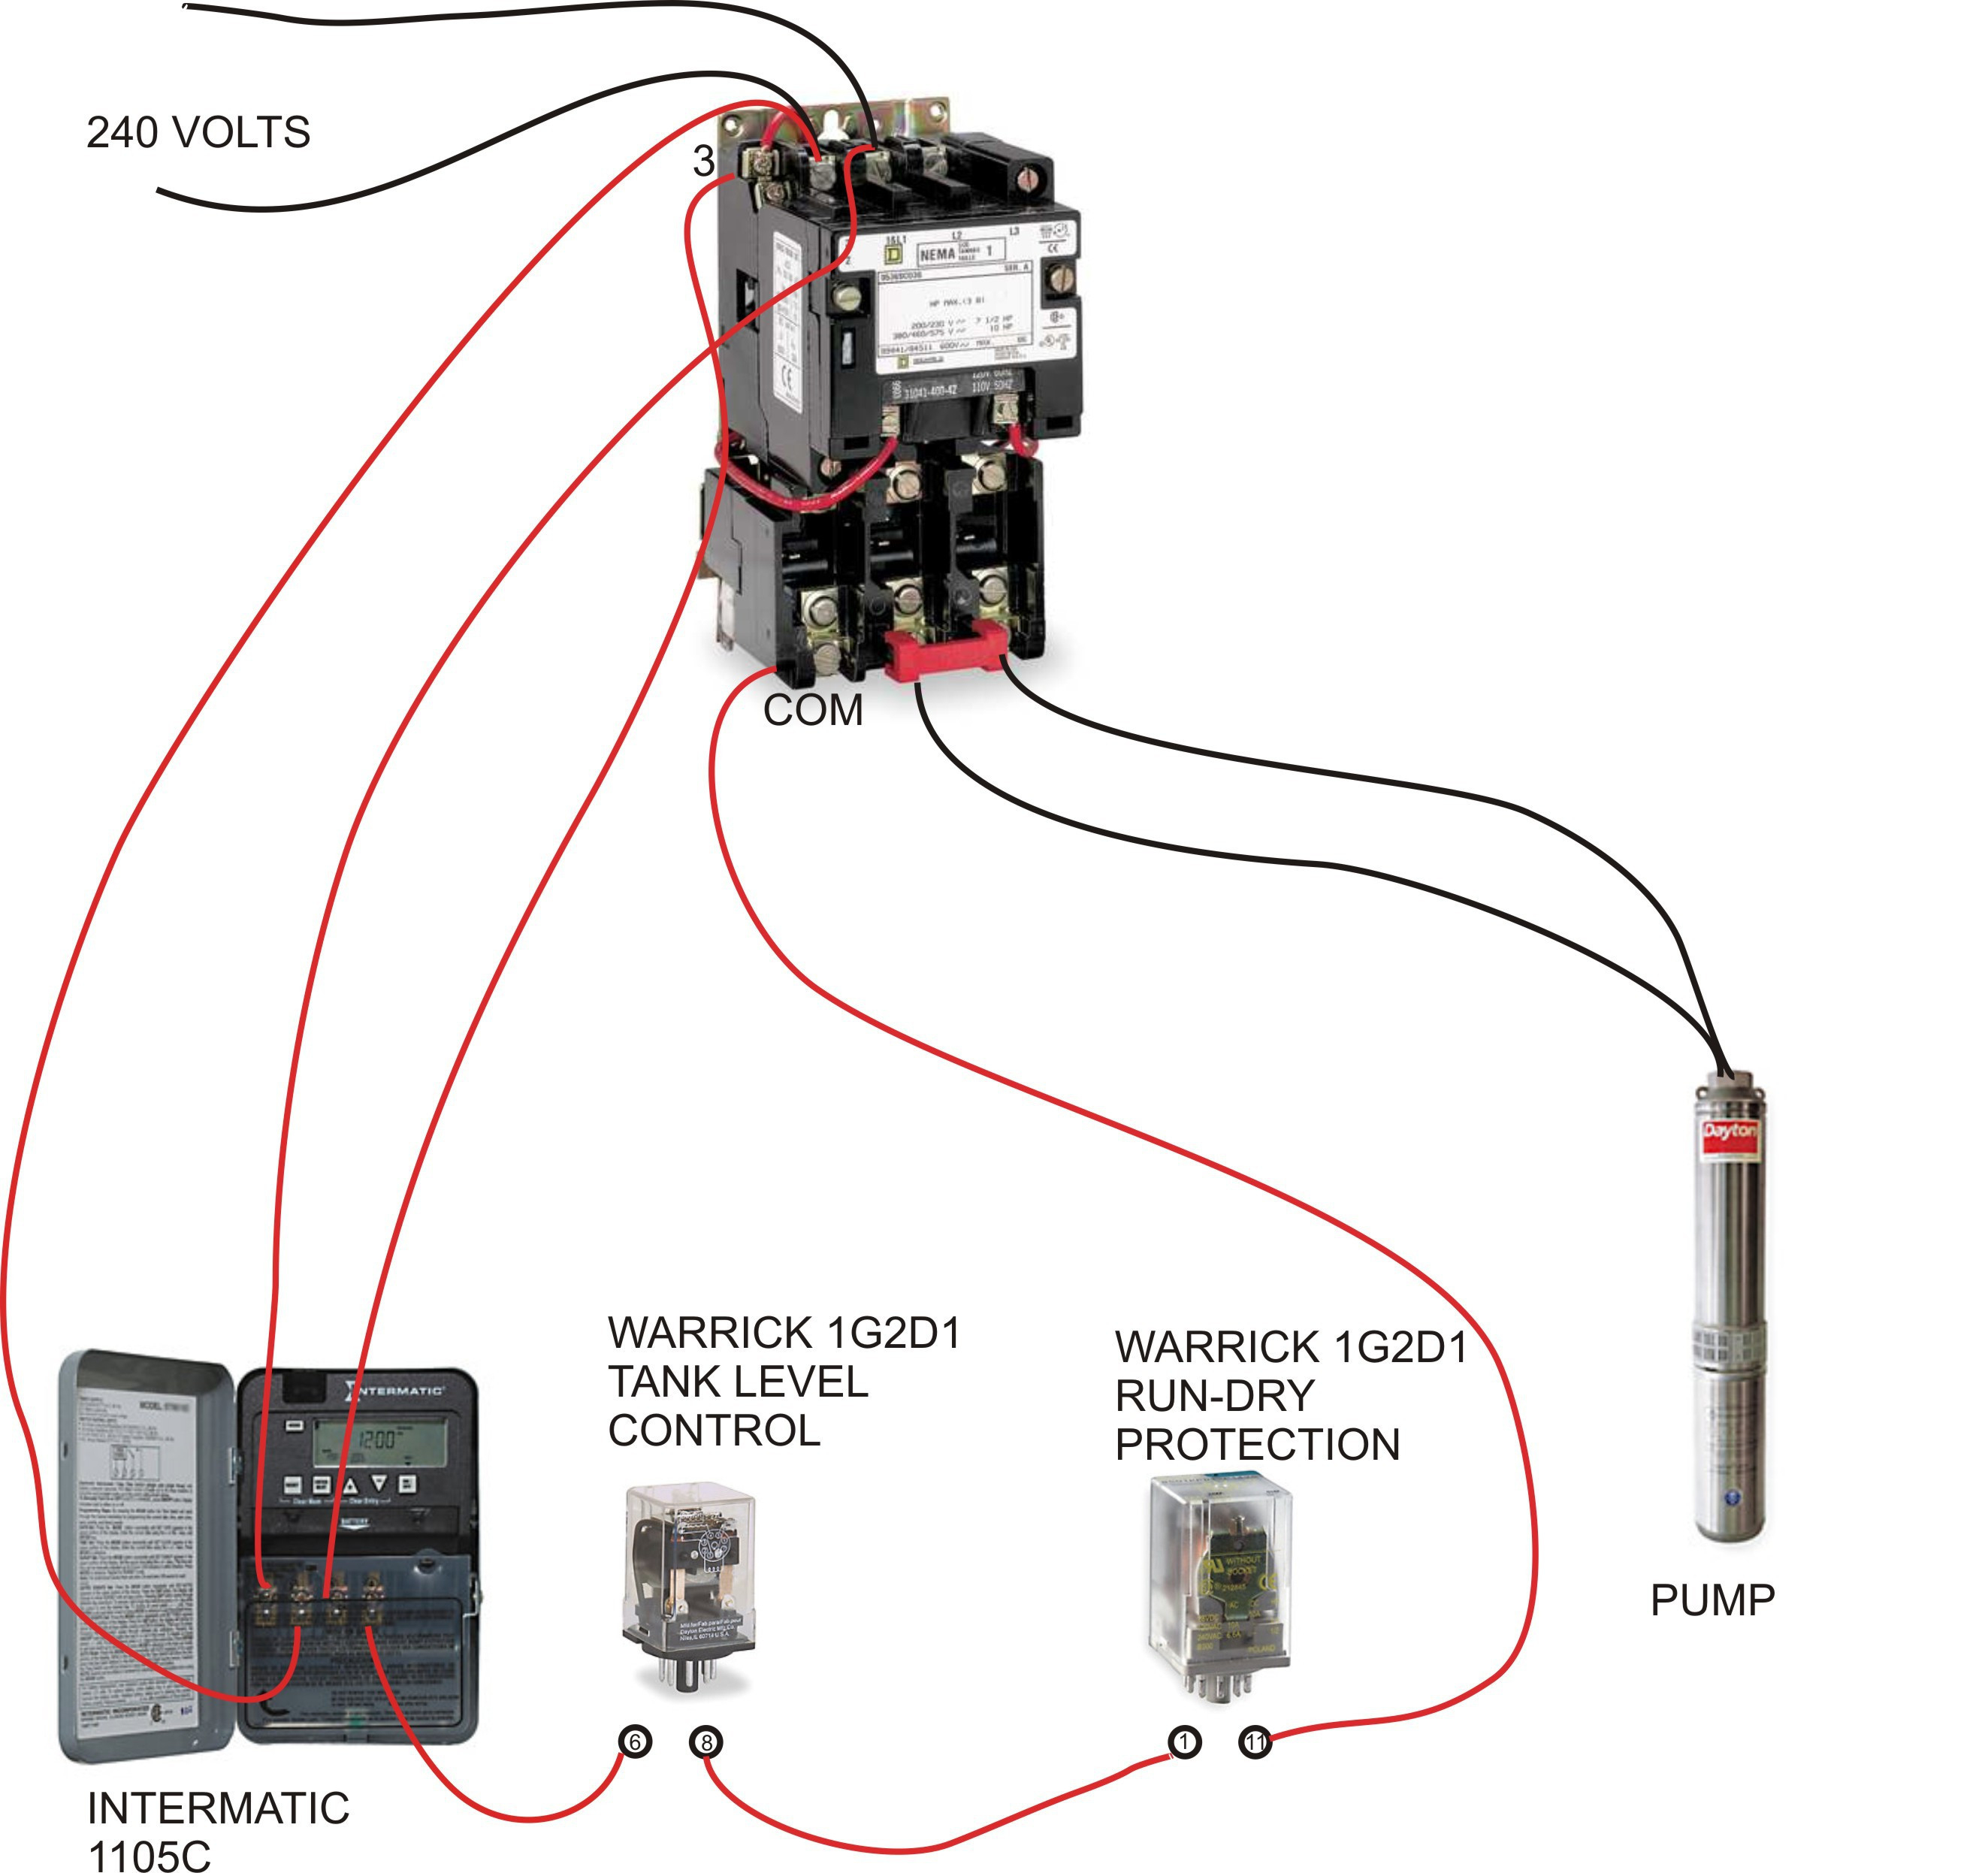 Water Pump Pressure Switch Diagram - Wiring Diagrams - Water Pump Pressure Switch Wiring Diagram